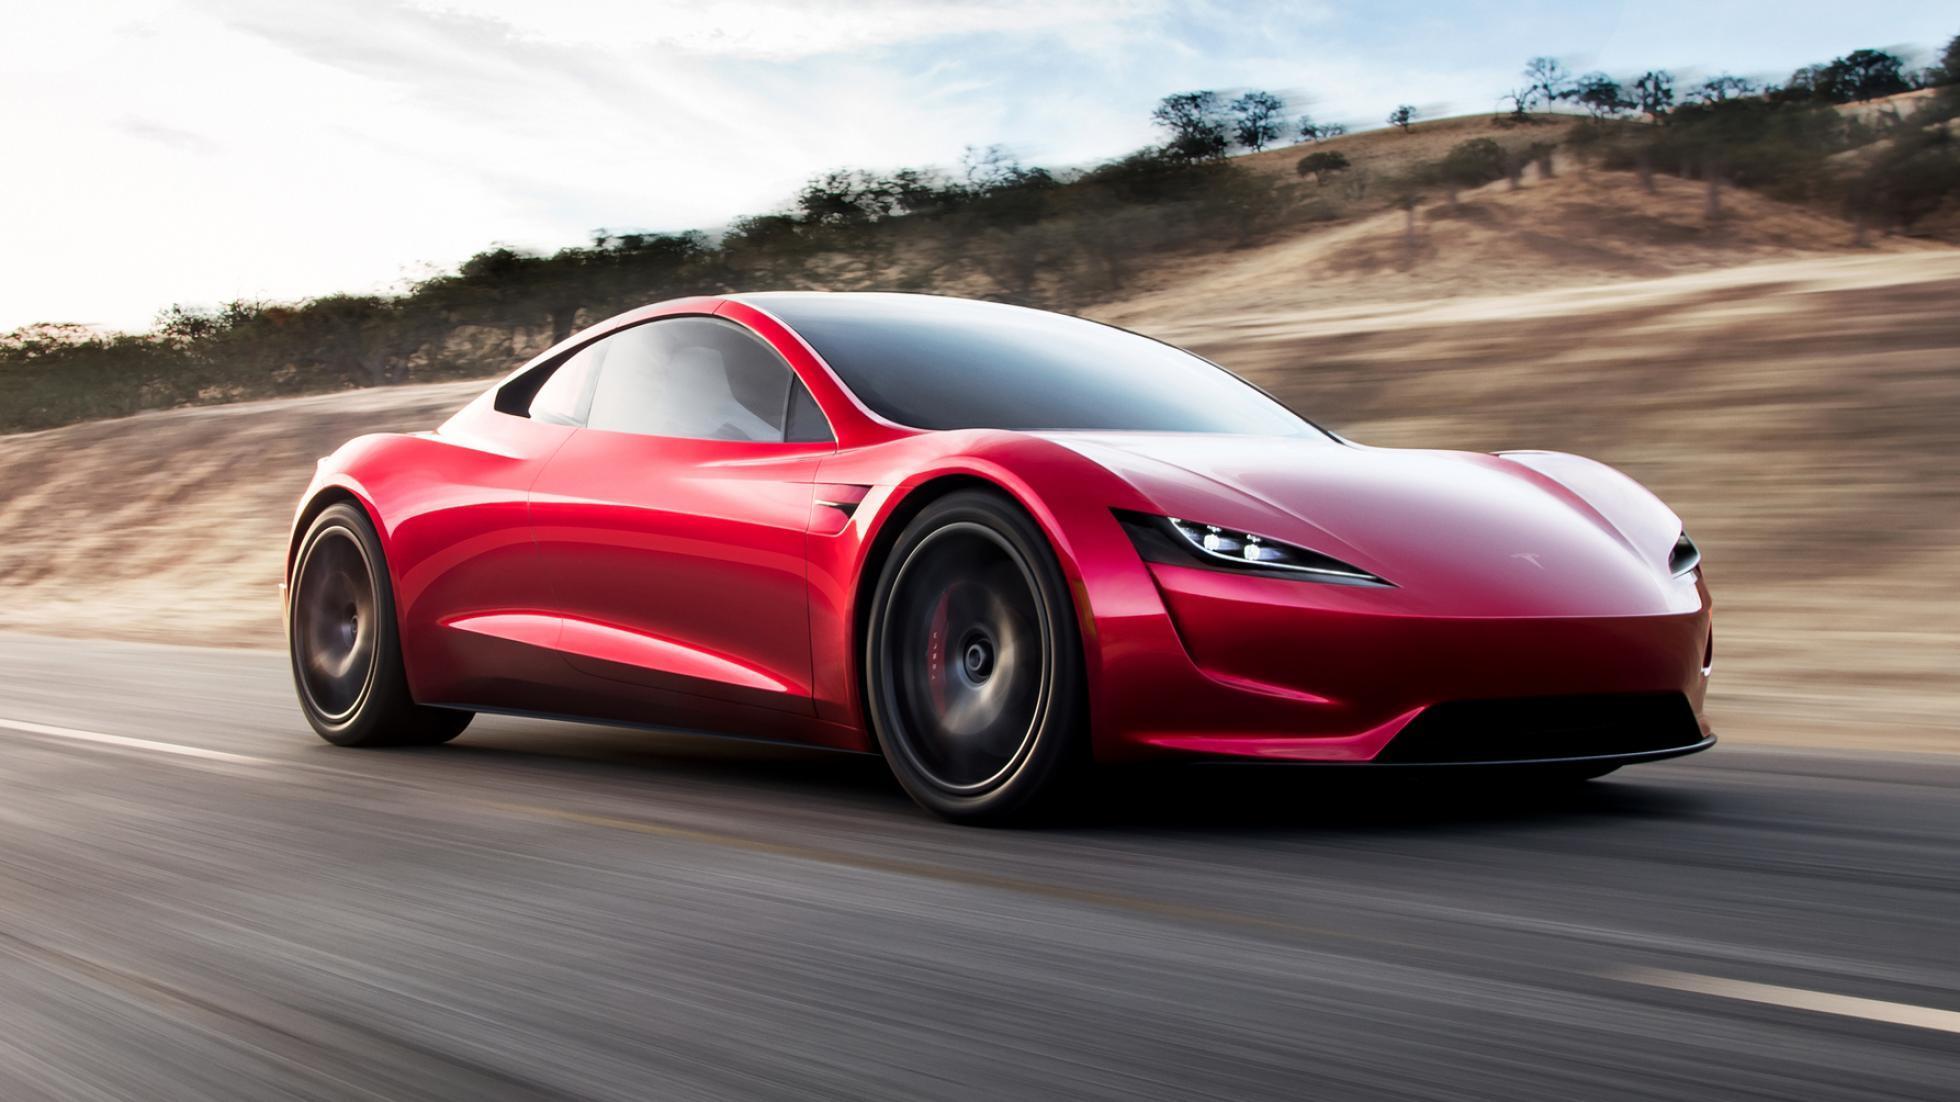 Surprise! It's the new 402kph Tesla Roadster